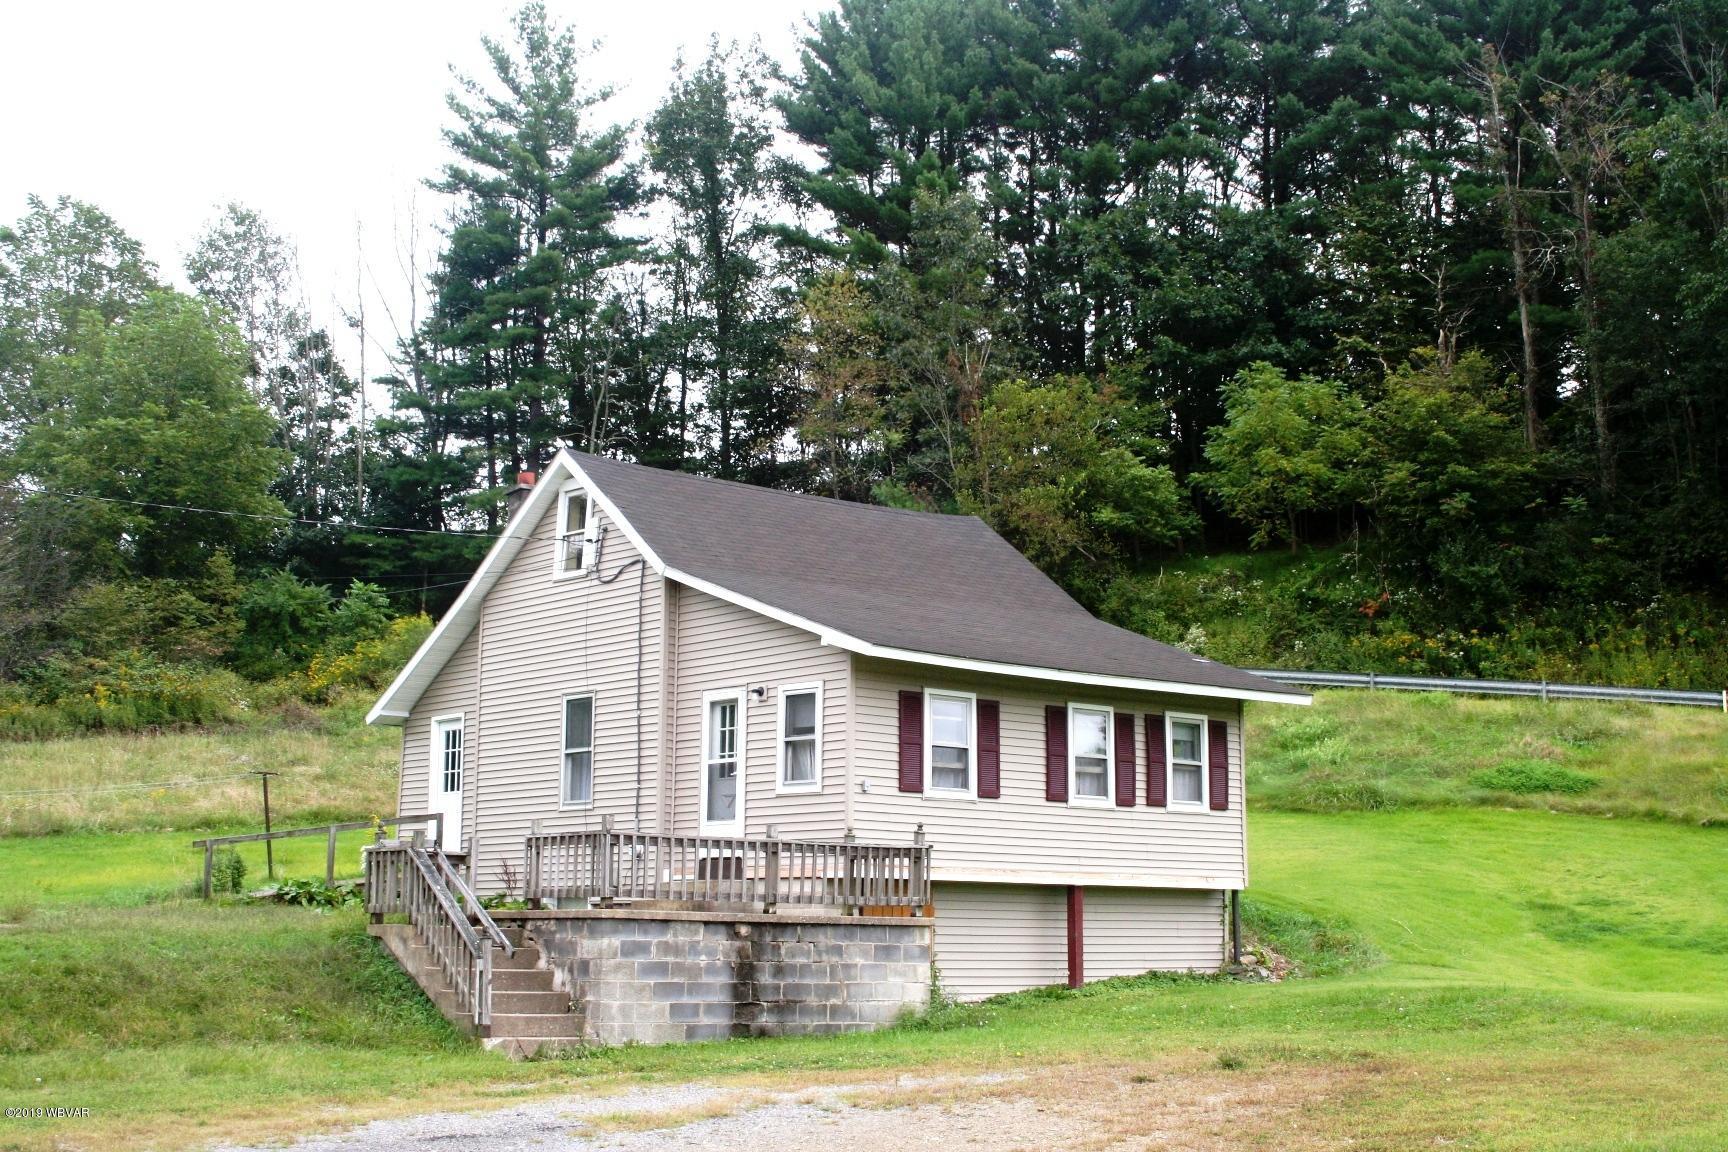 6332 RTE 220 HIGHWAY,Hughesville,PA 17737,2 Bedrooms Bedrooms,Residential,RTE 220,WB-88582